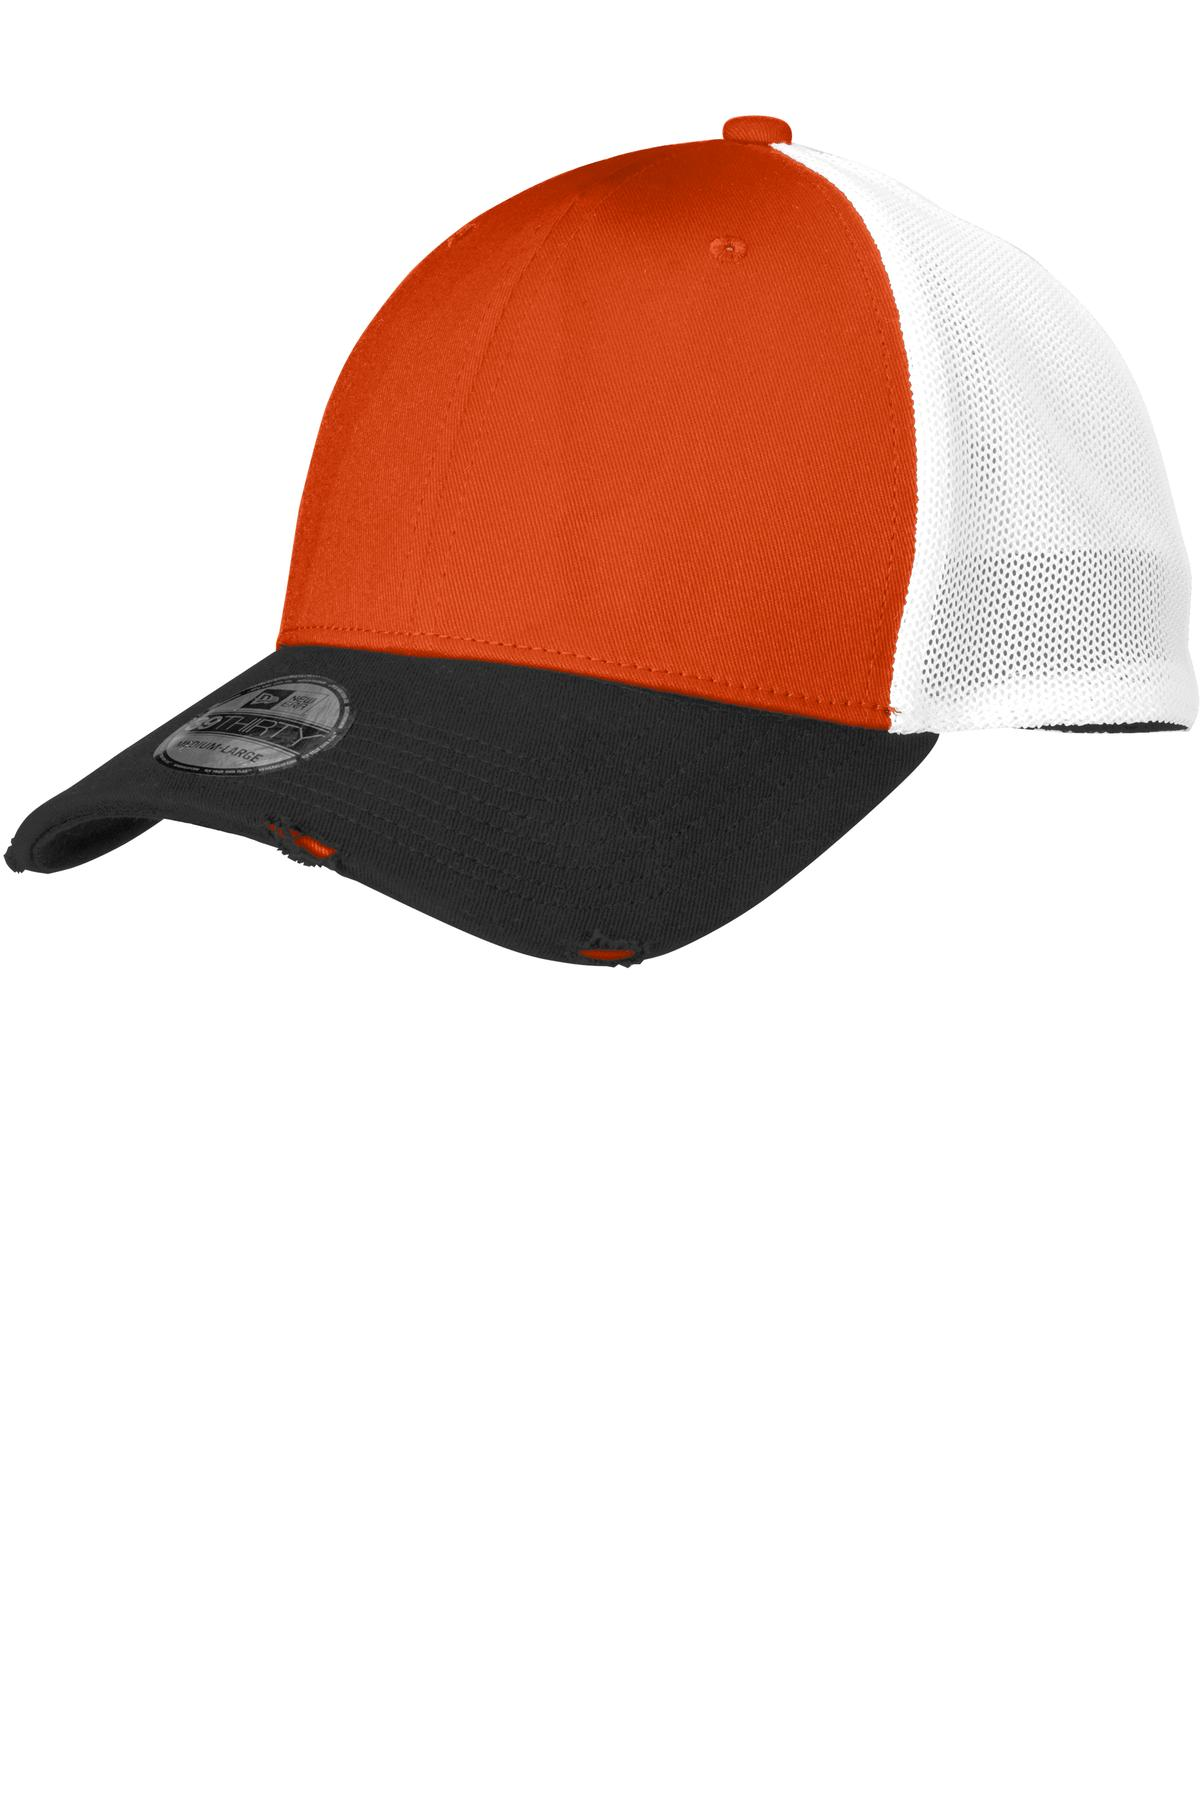 click to view Black/ Deep Orange / White